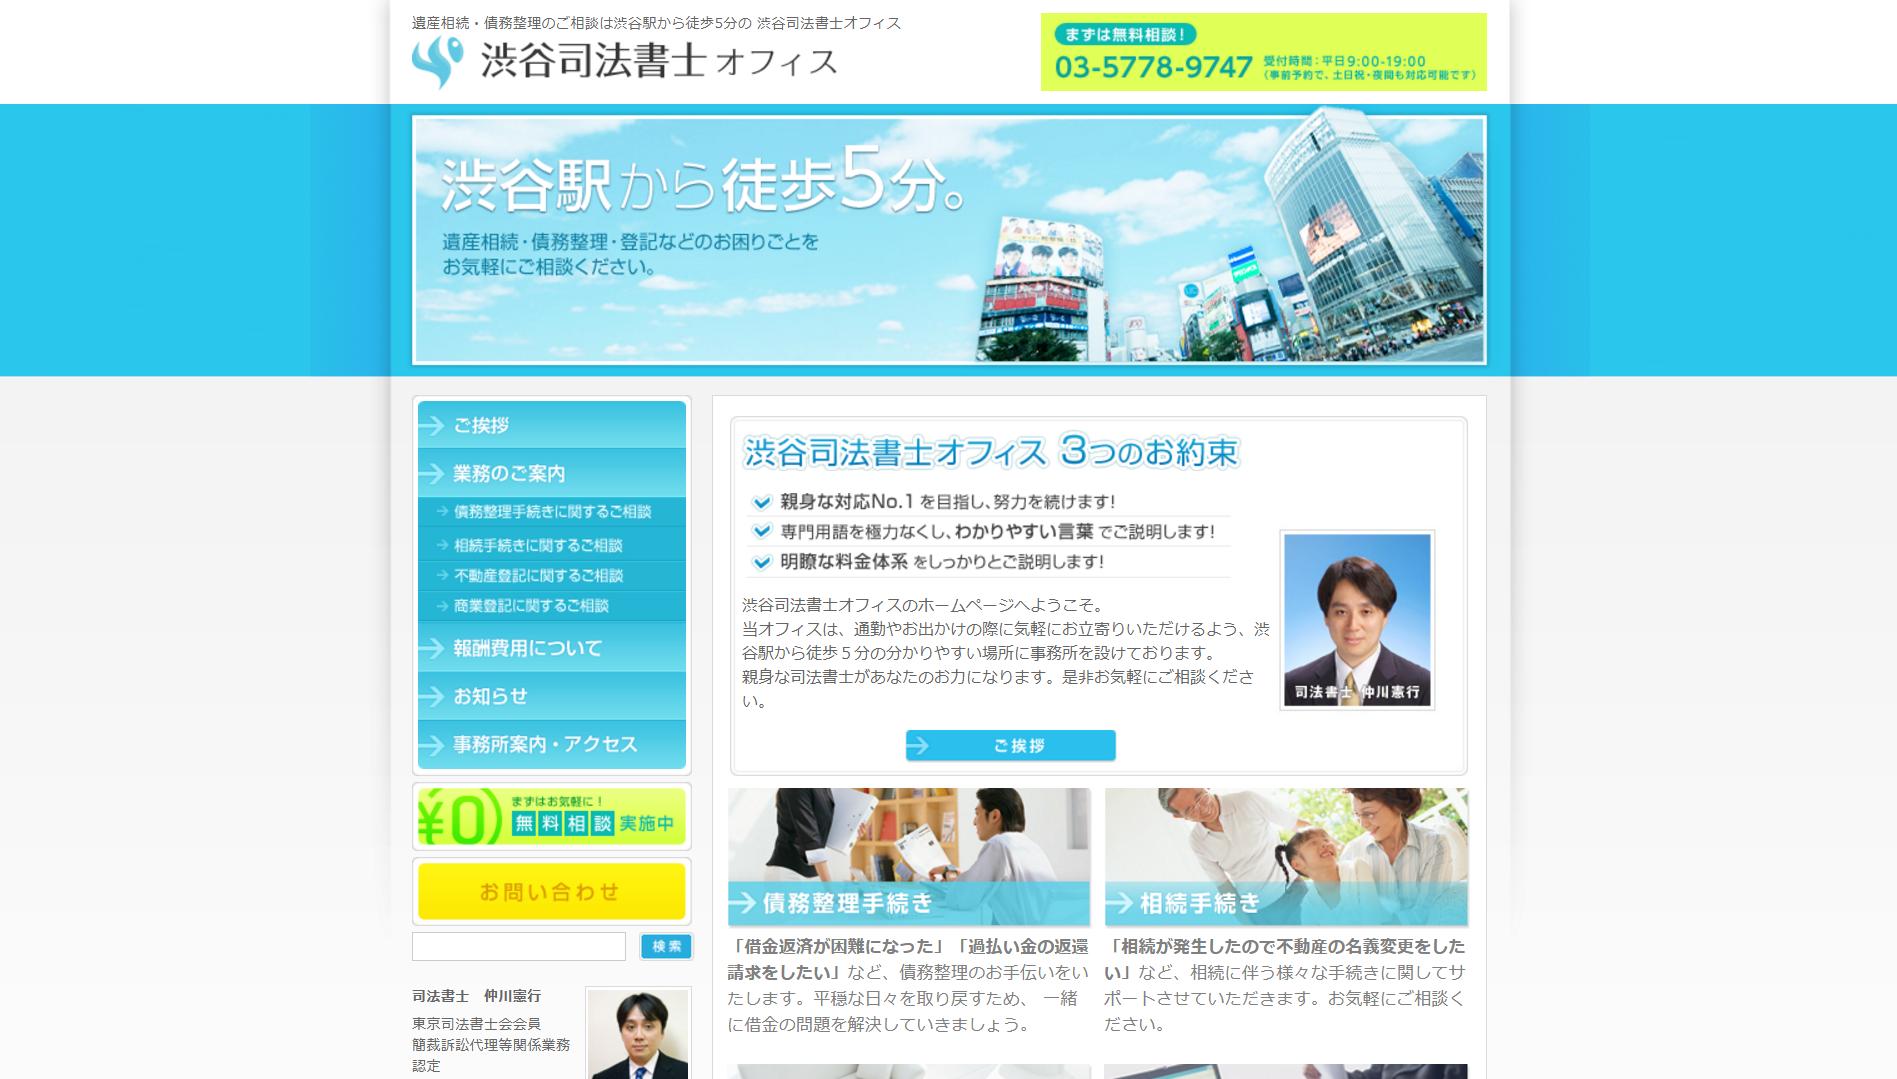 渋谷司法書士オフィス(東京都渋谷区渋谷)